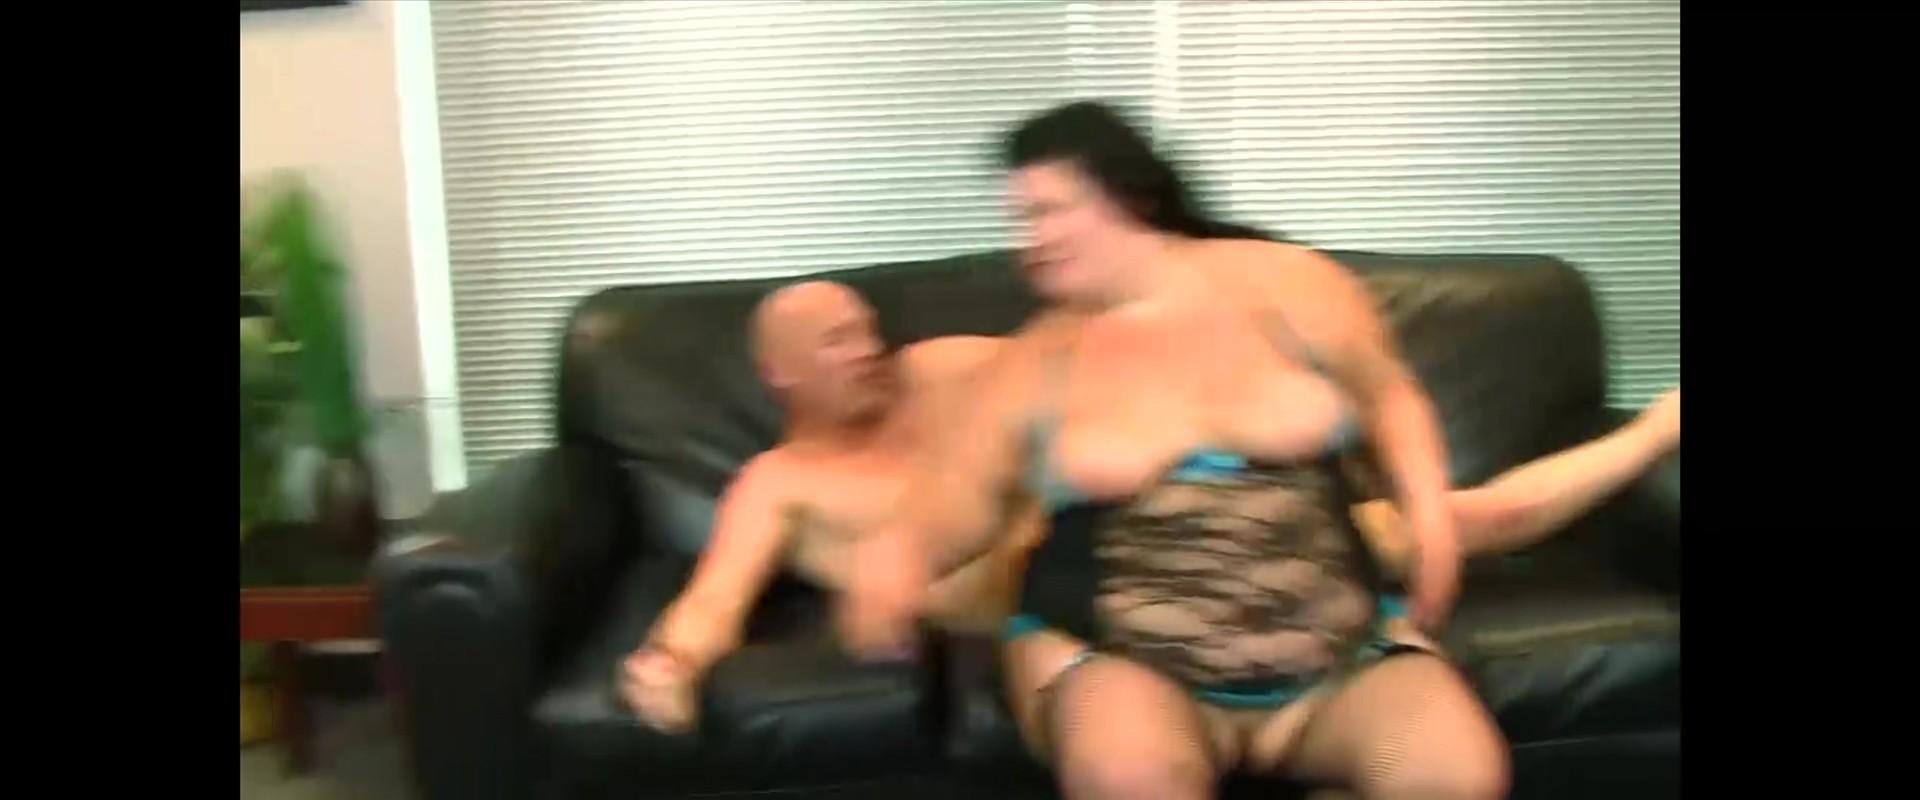 Woman licks own clit